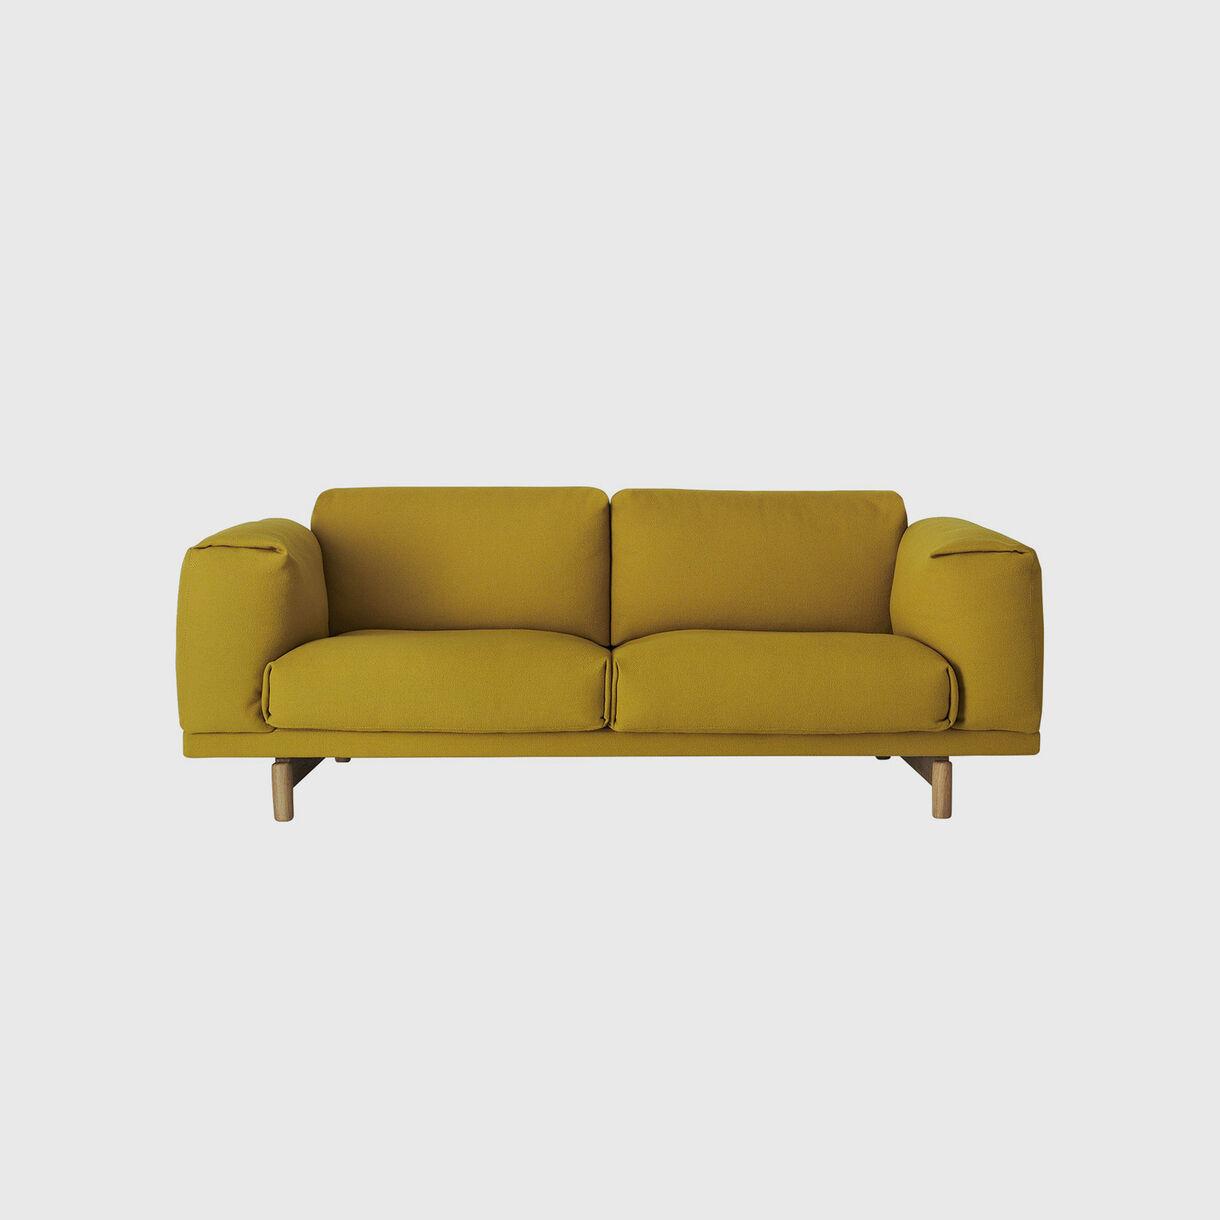 Rest Sofa, 2 Seater